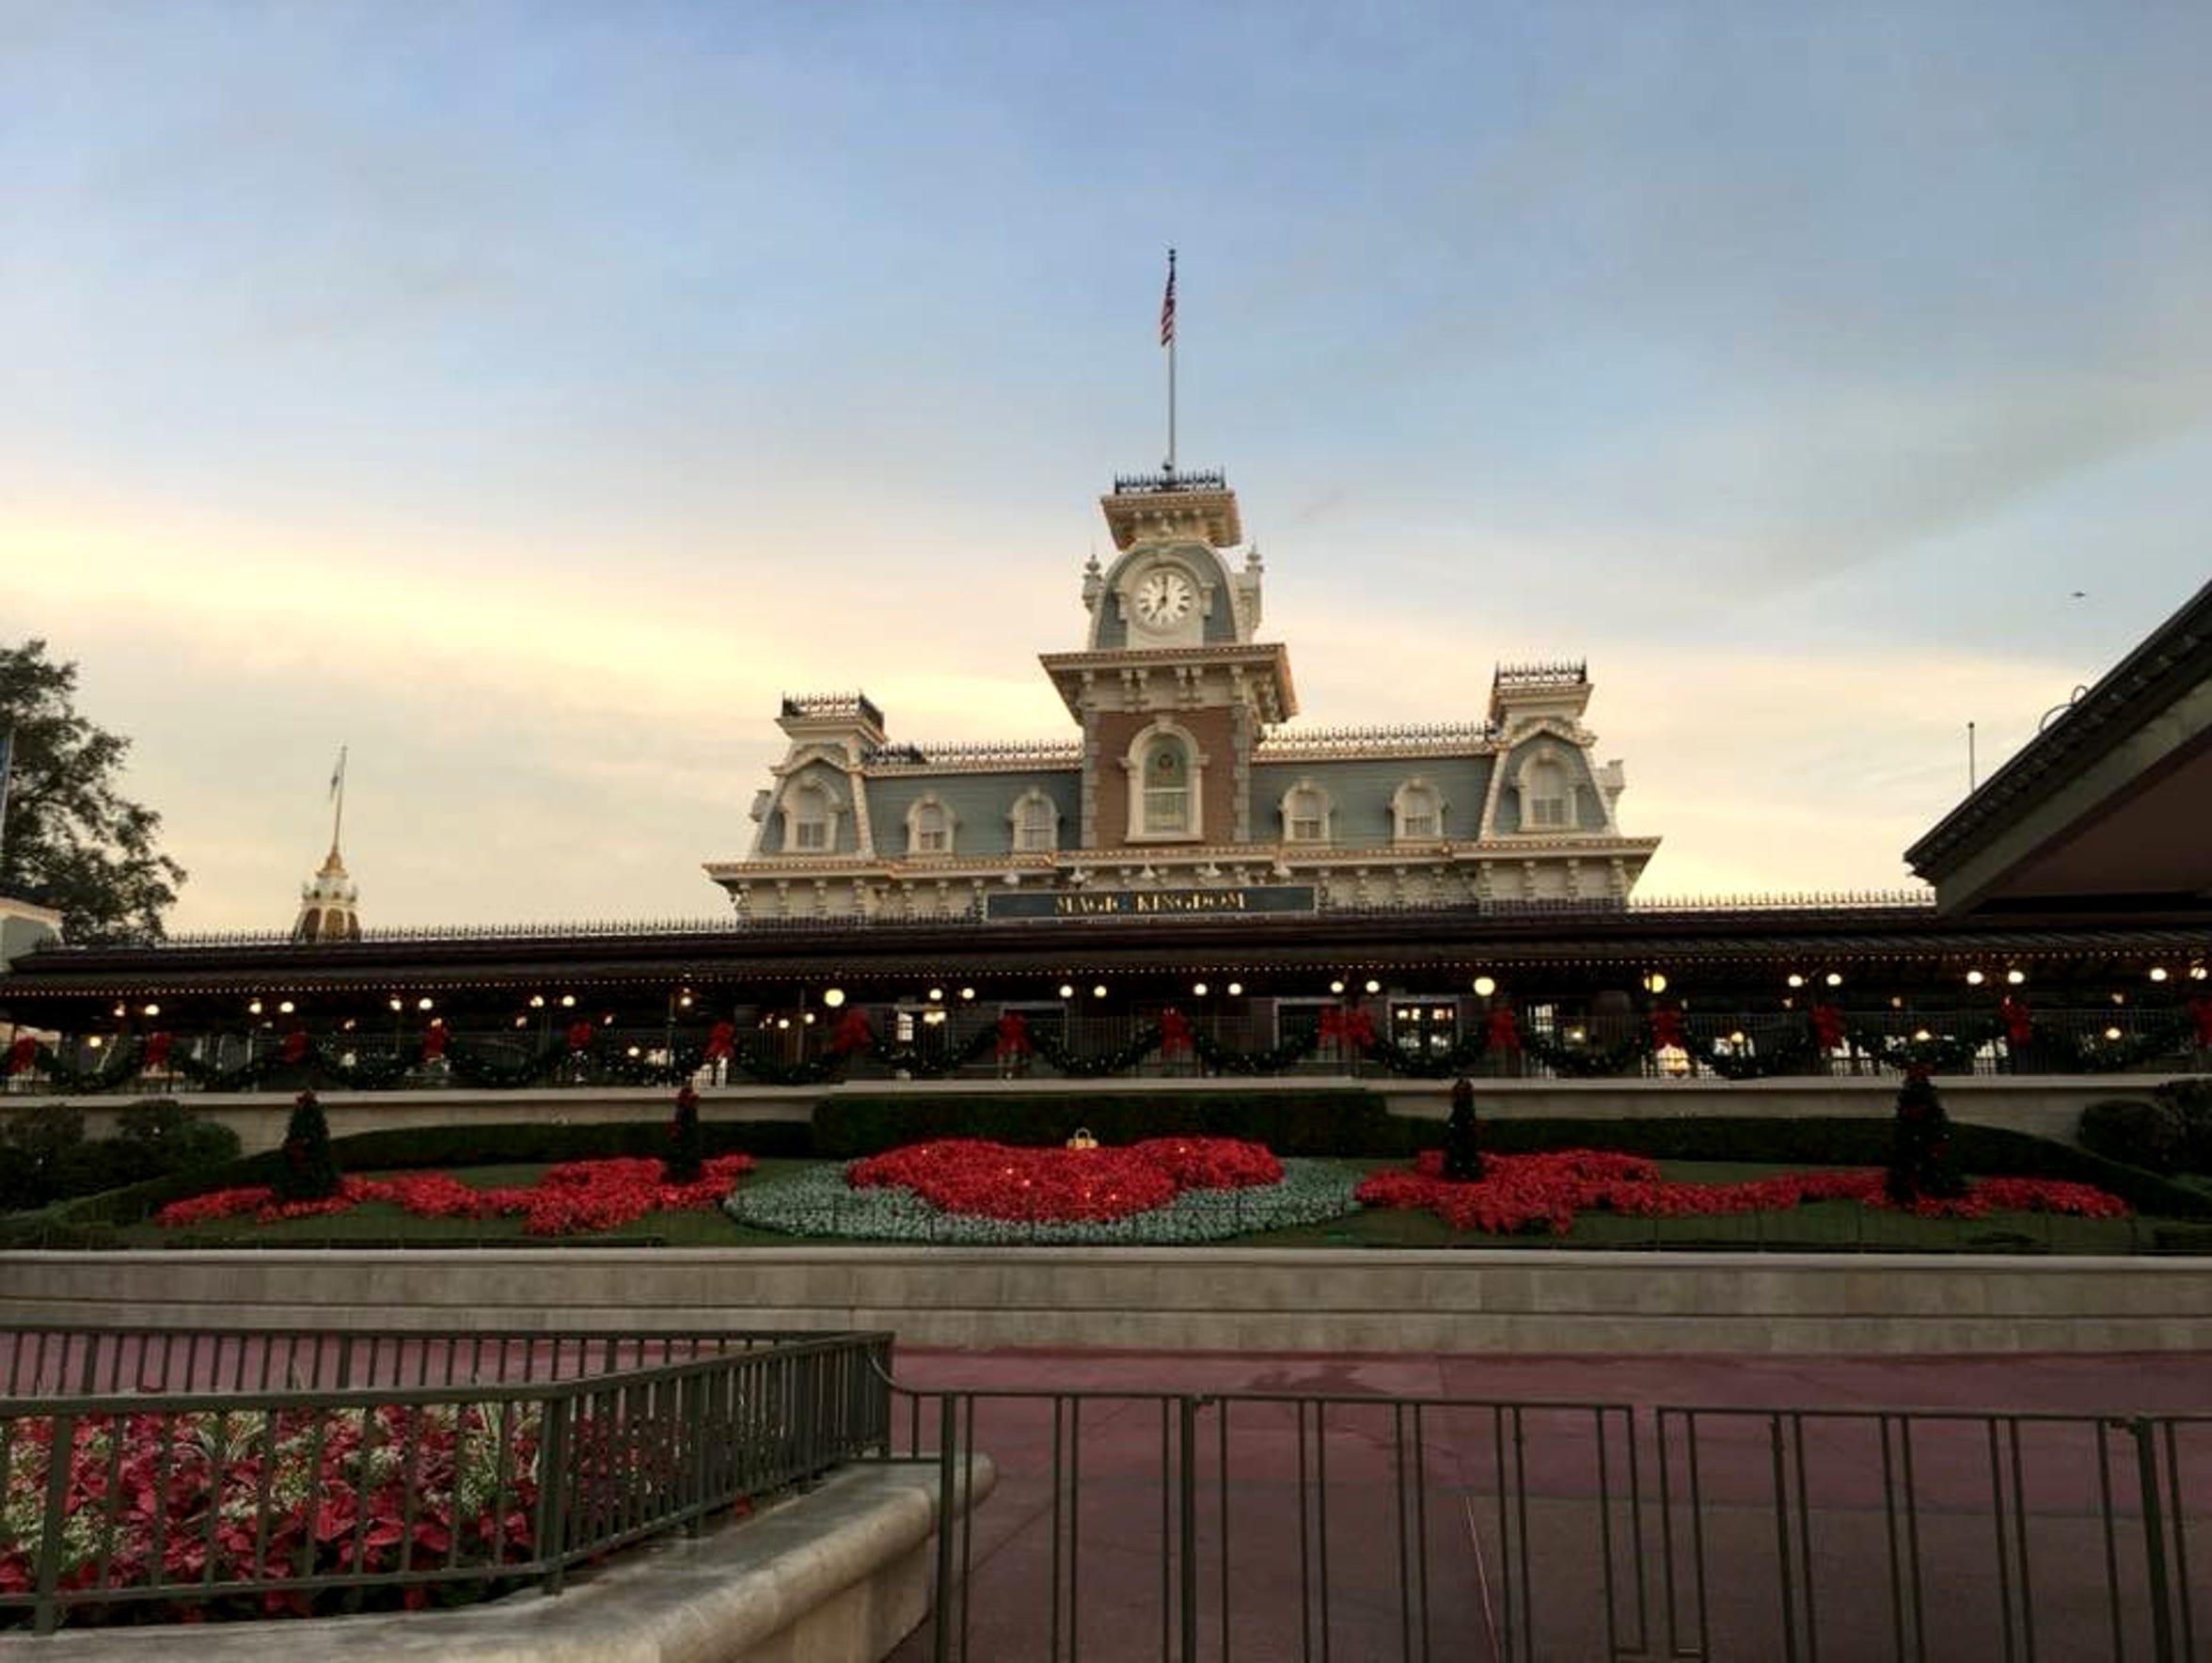 The entrance to Disney World's Magic Kingdom.